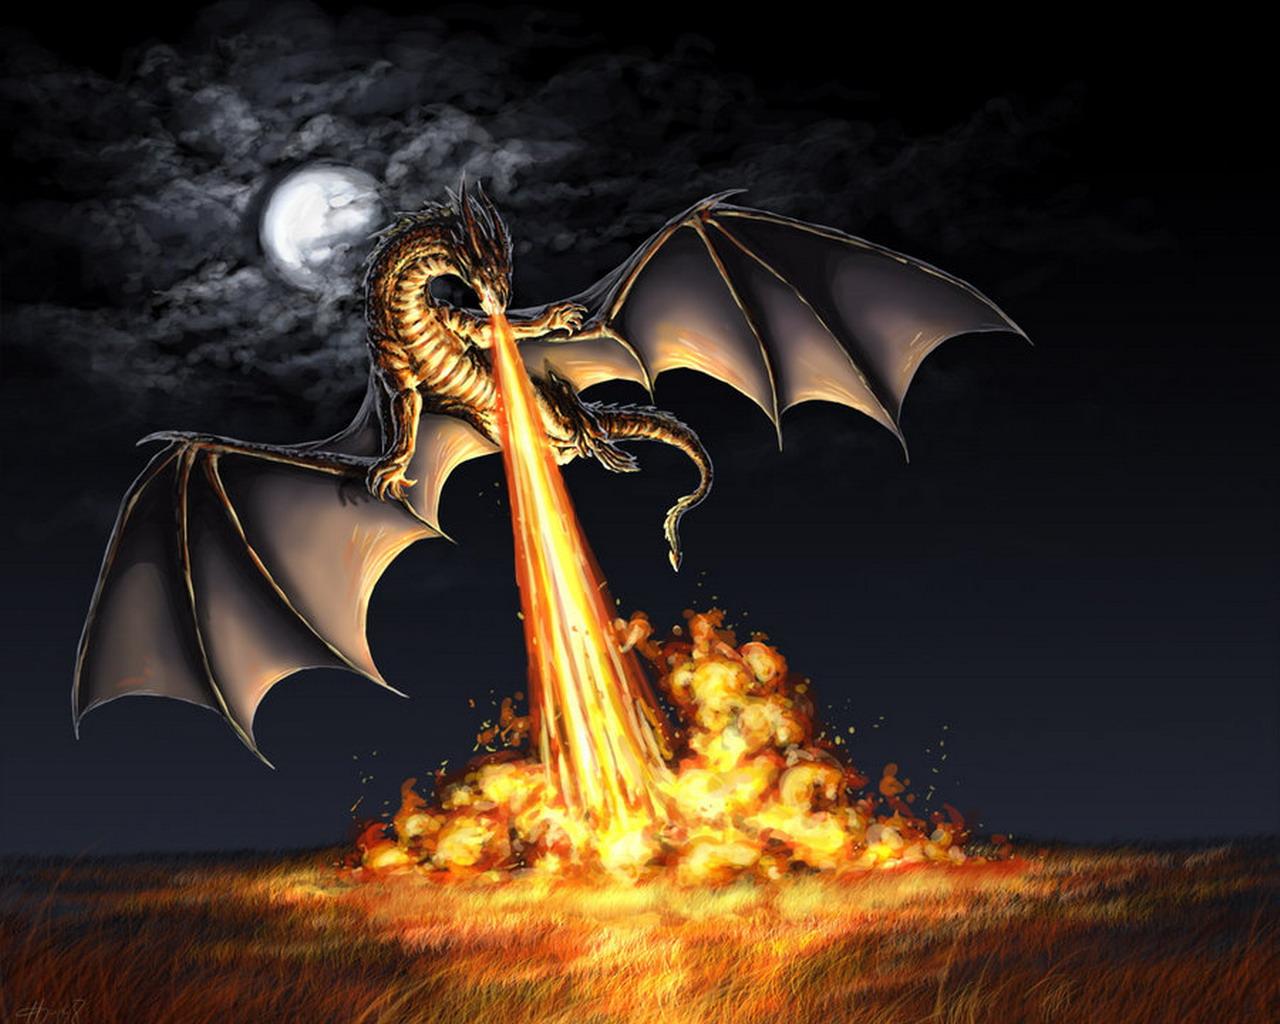 76 ] Dragon Desktop Wallpaper On WallpaperSafari